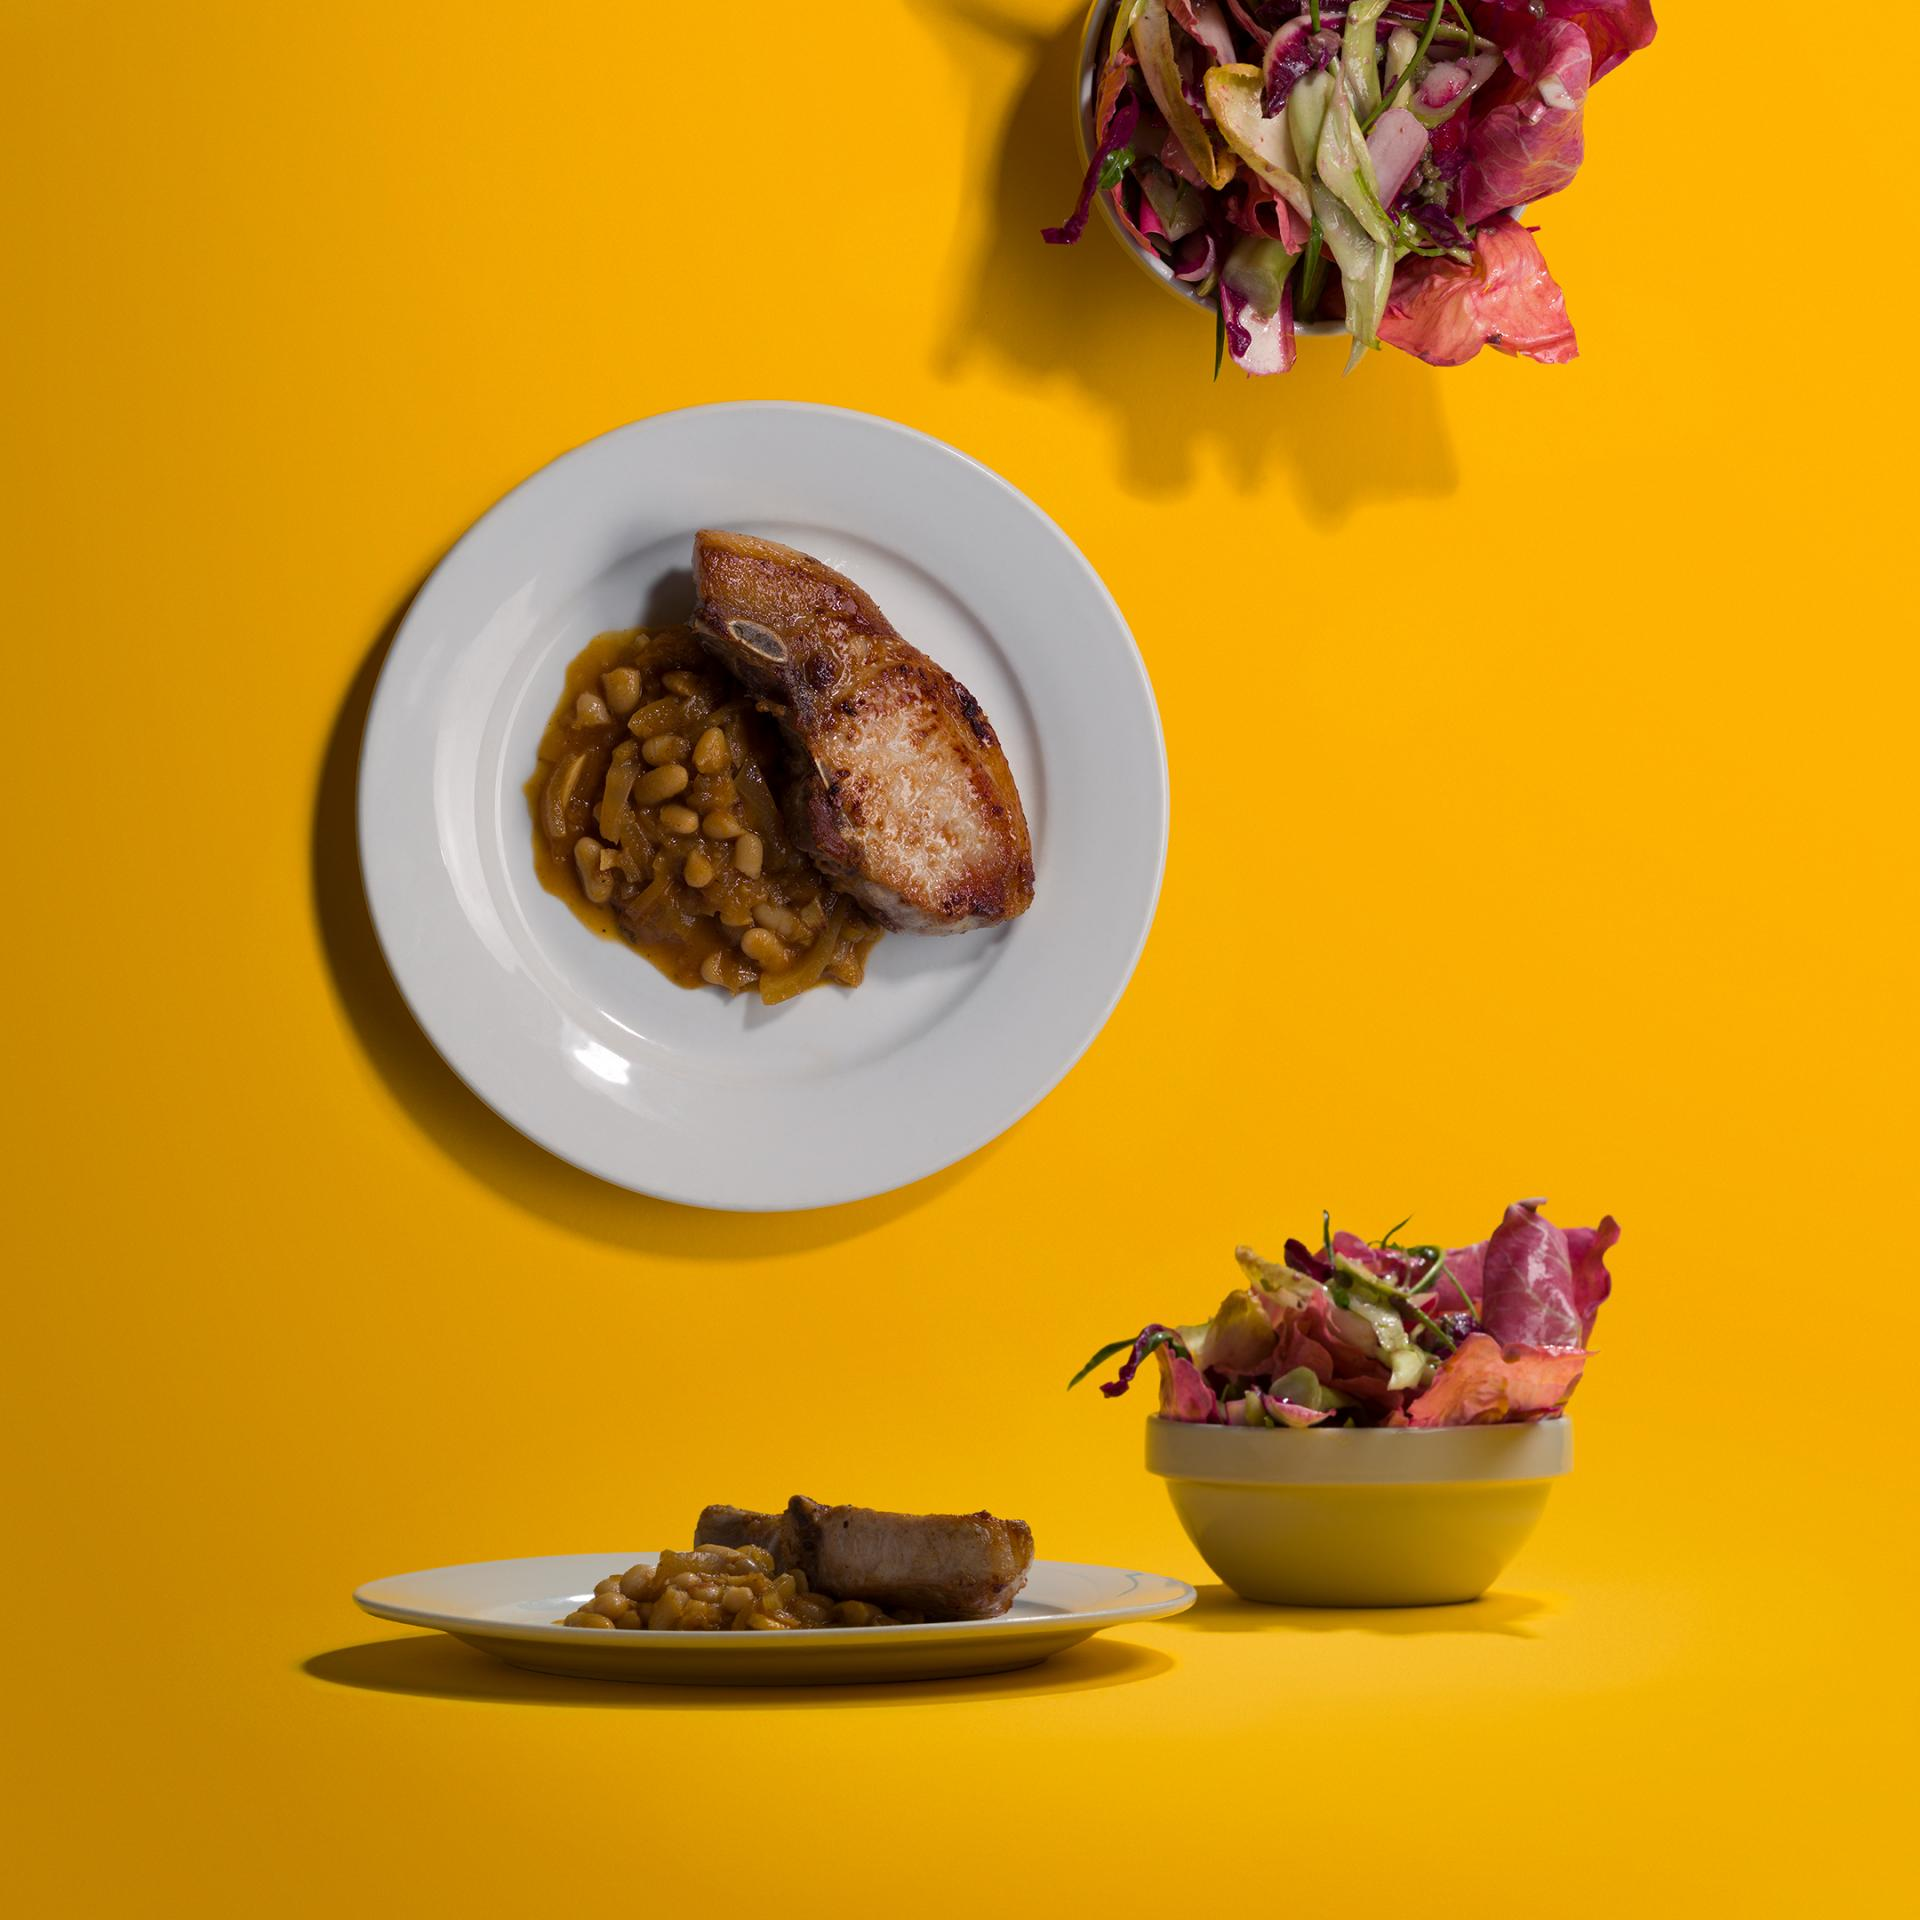 Margot Henderson's pork chop, beans and radichio salad